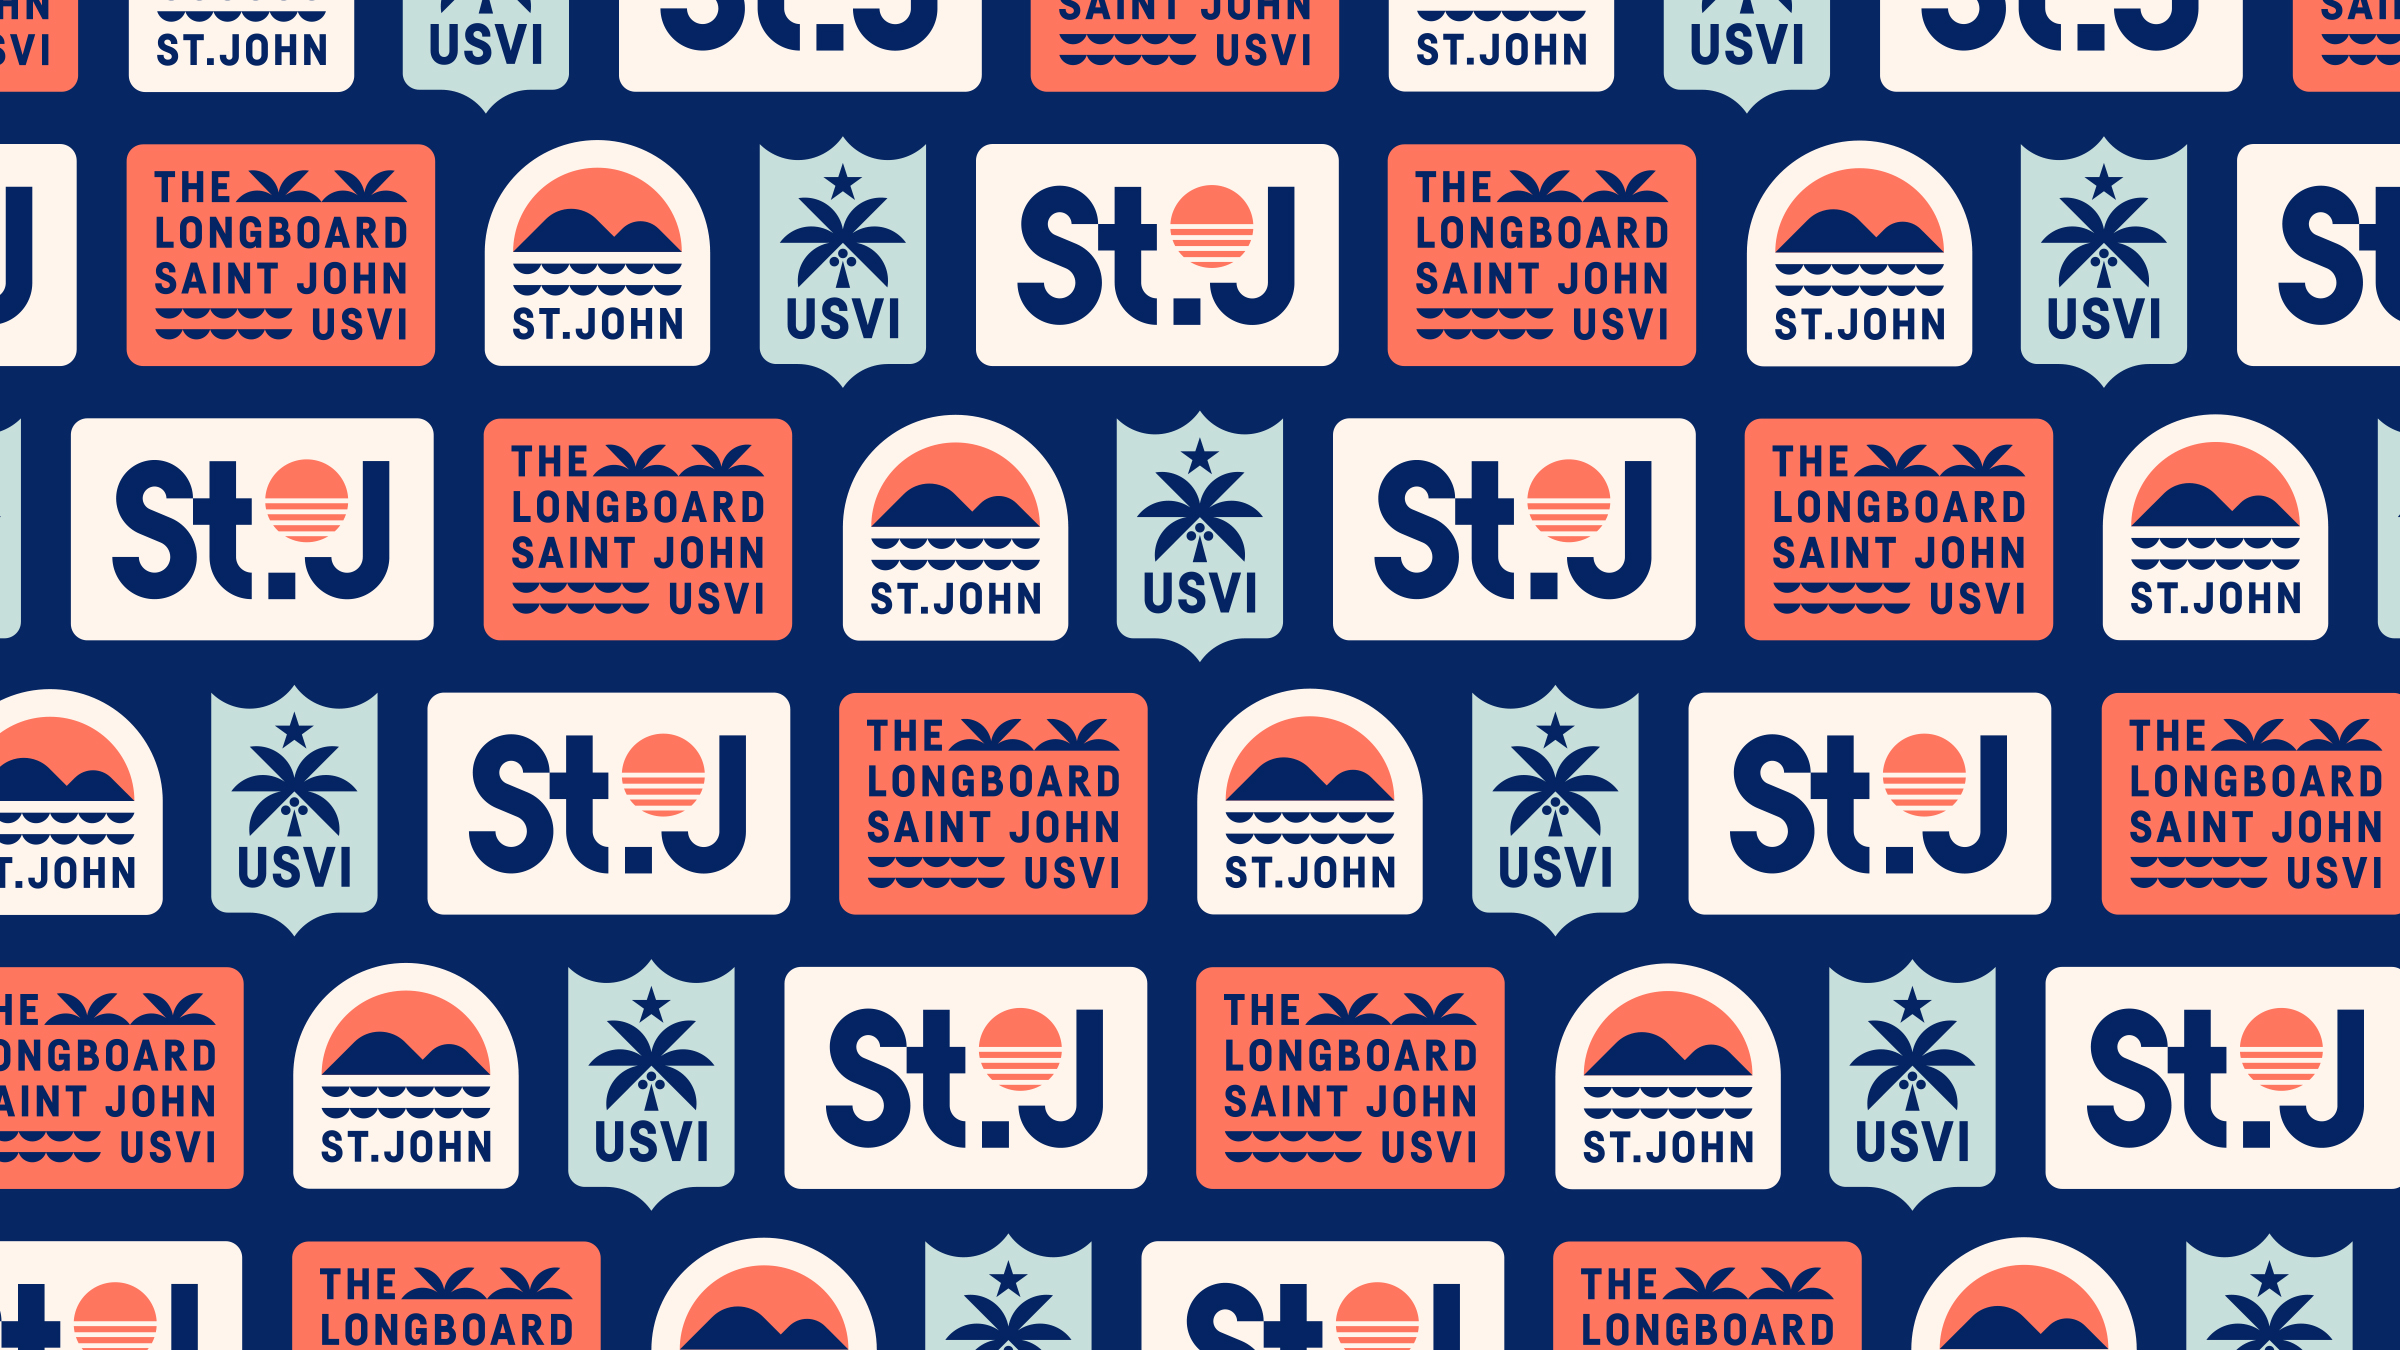 The Longboard Saint John USVI Stickers